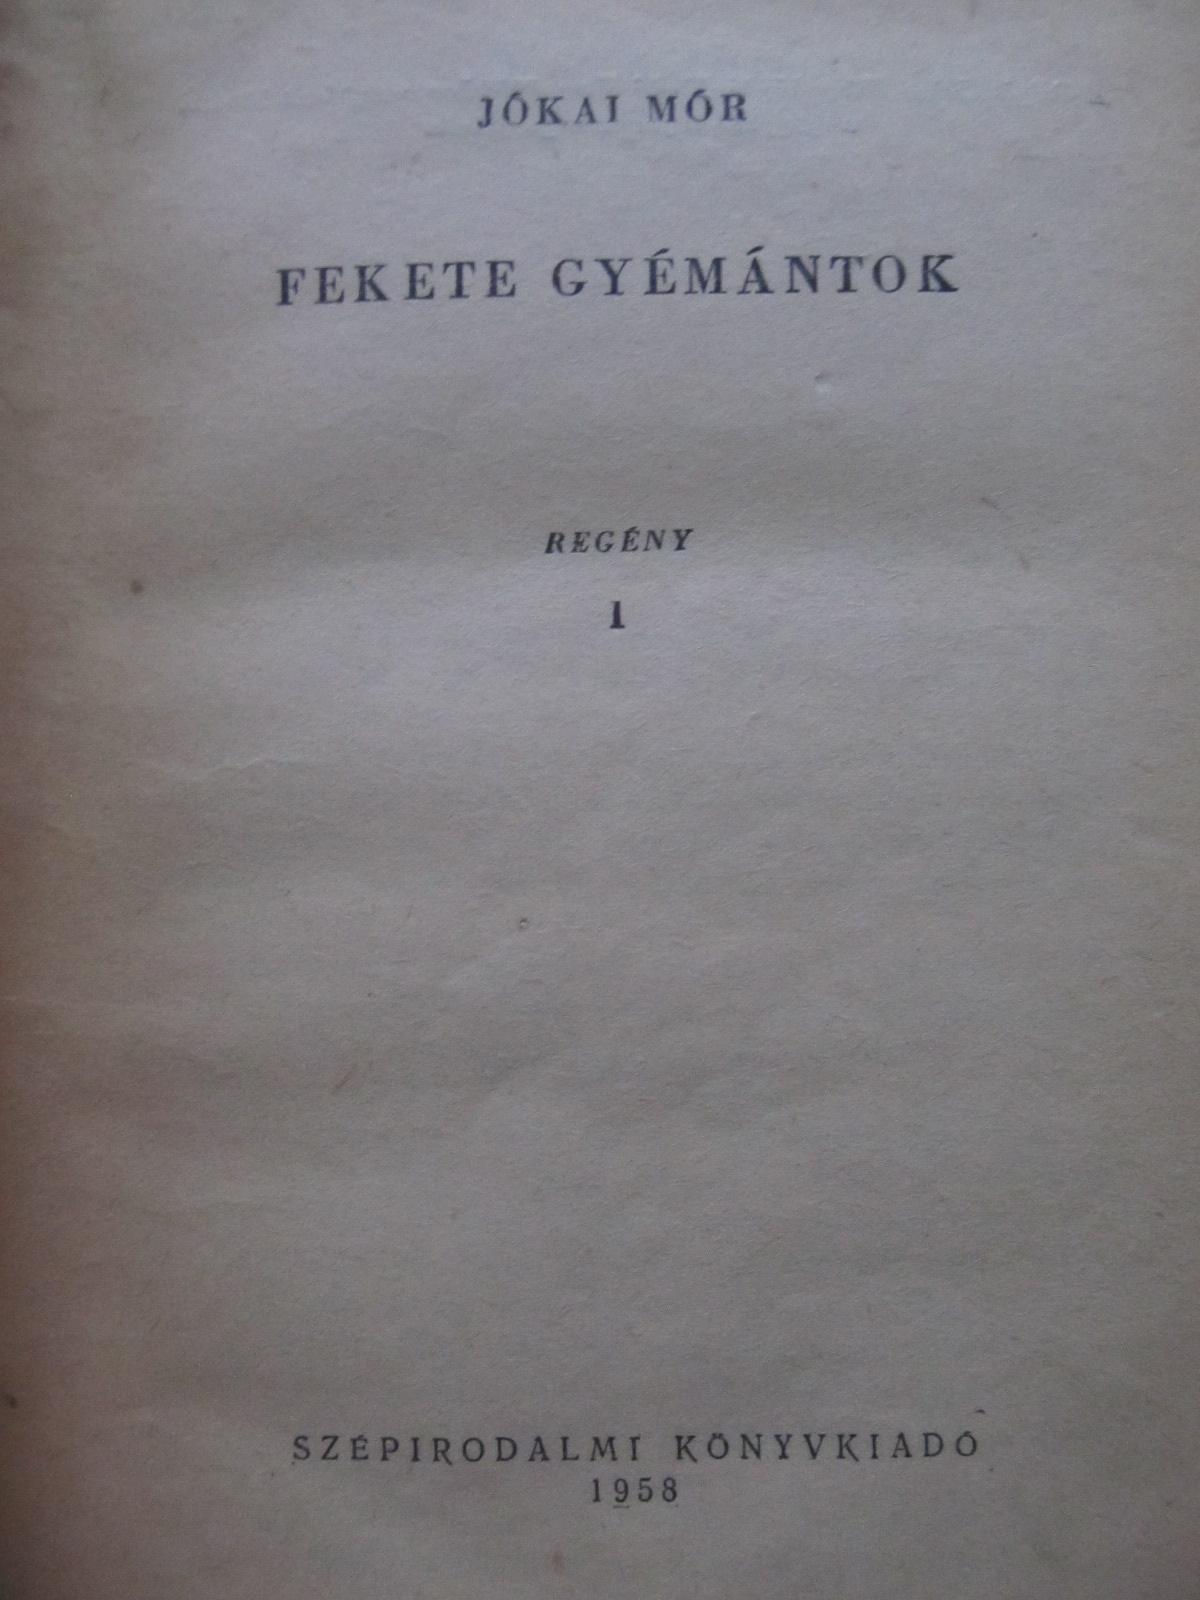 Fekete gyemantok (2 vol.) - Jokai Mor | Detalii carte